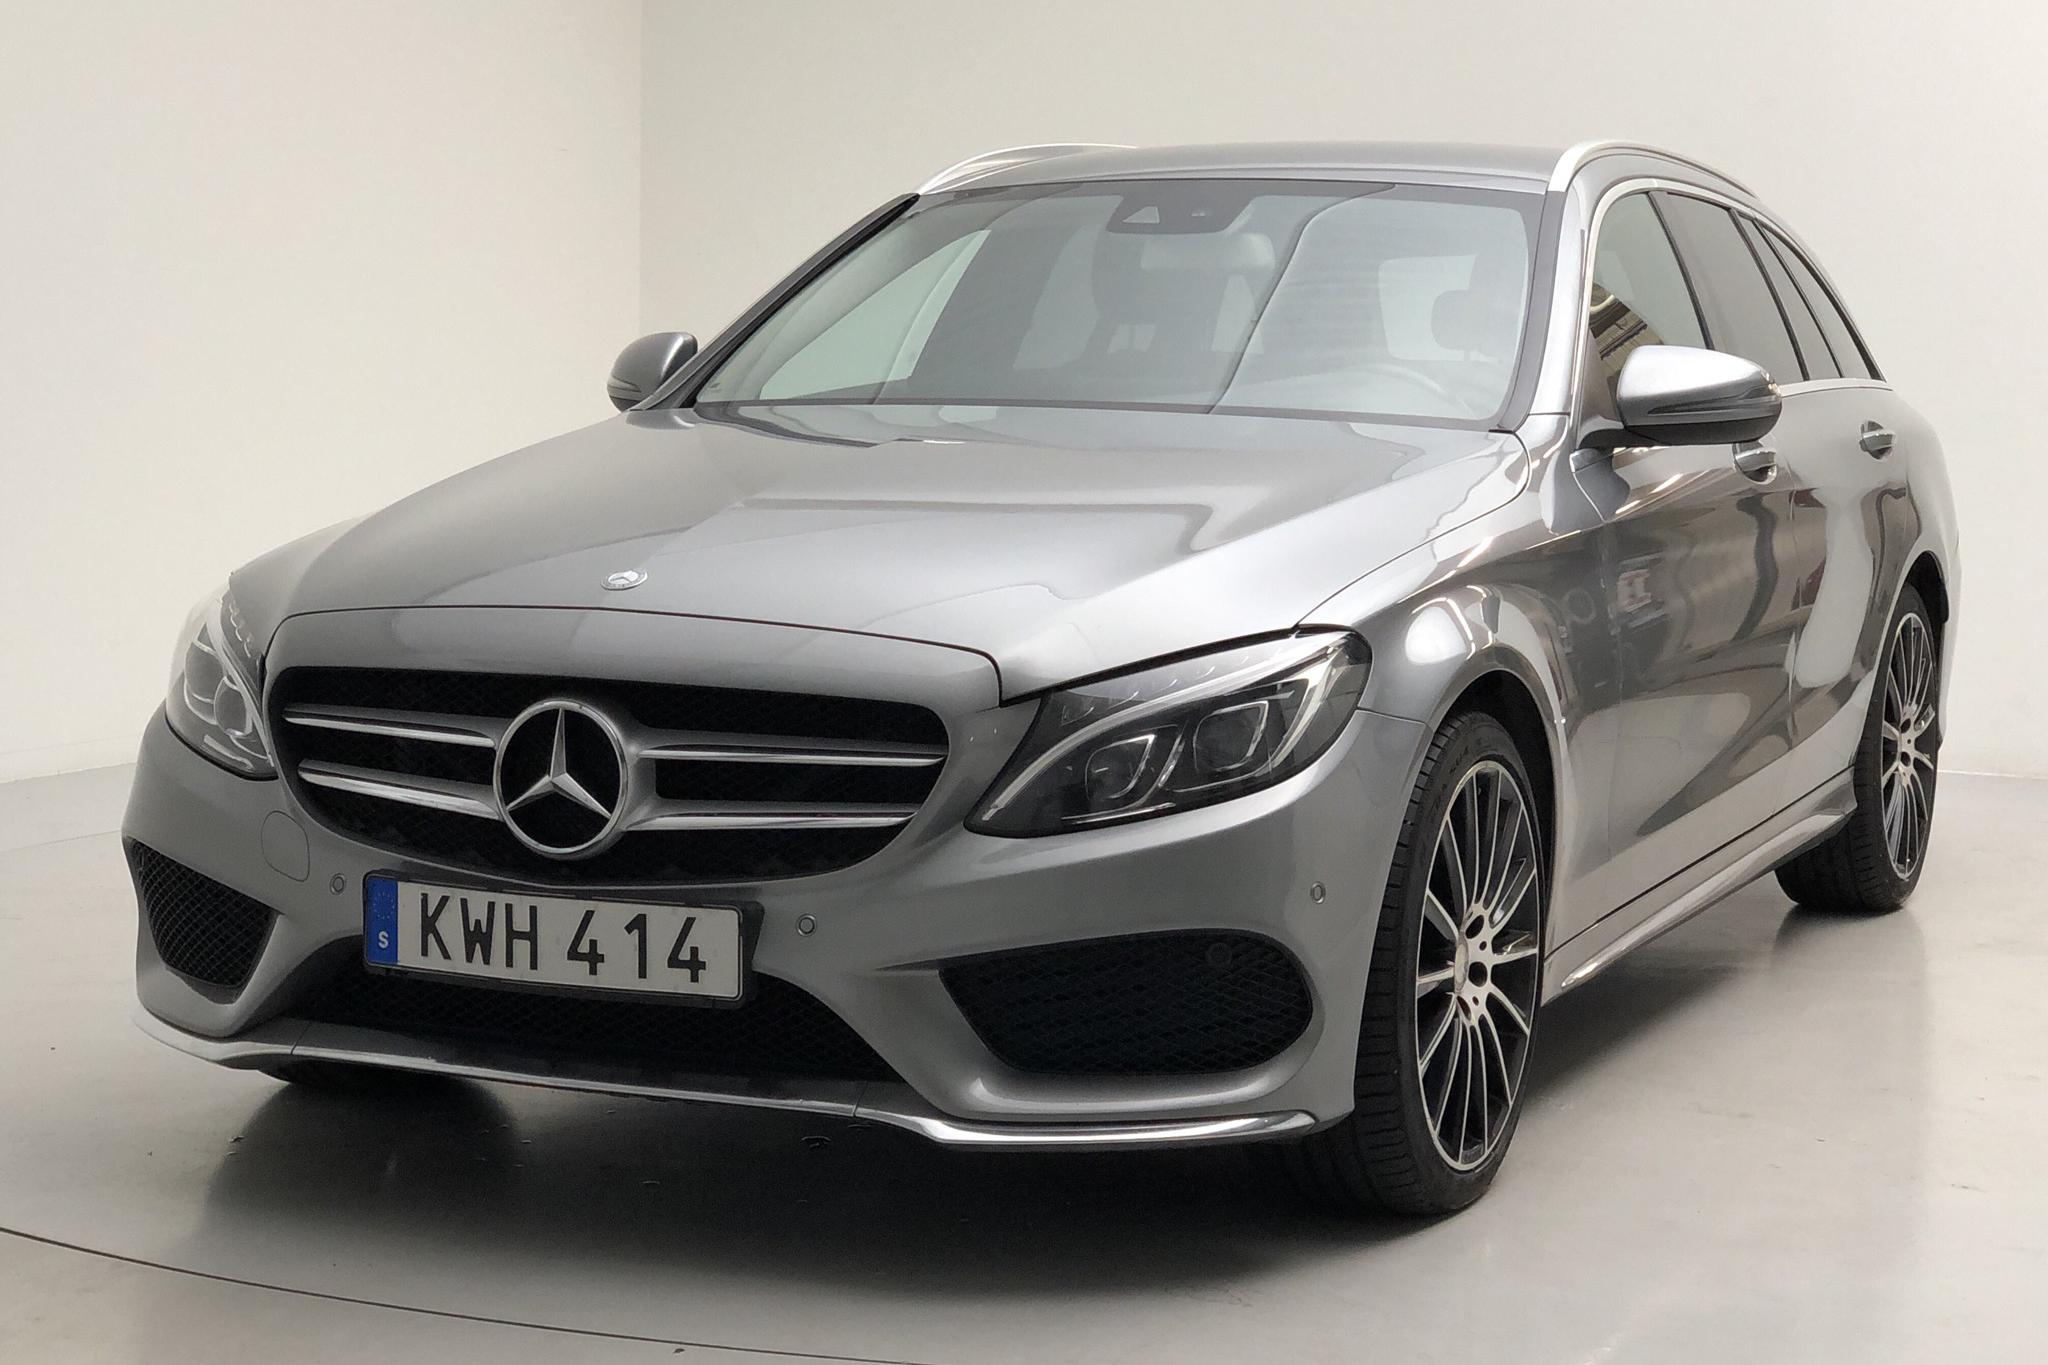 Mercedes C 250 d 4MATIC Kombi S205 (204hk) - 11 774 mil - Automat - silver - 2015